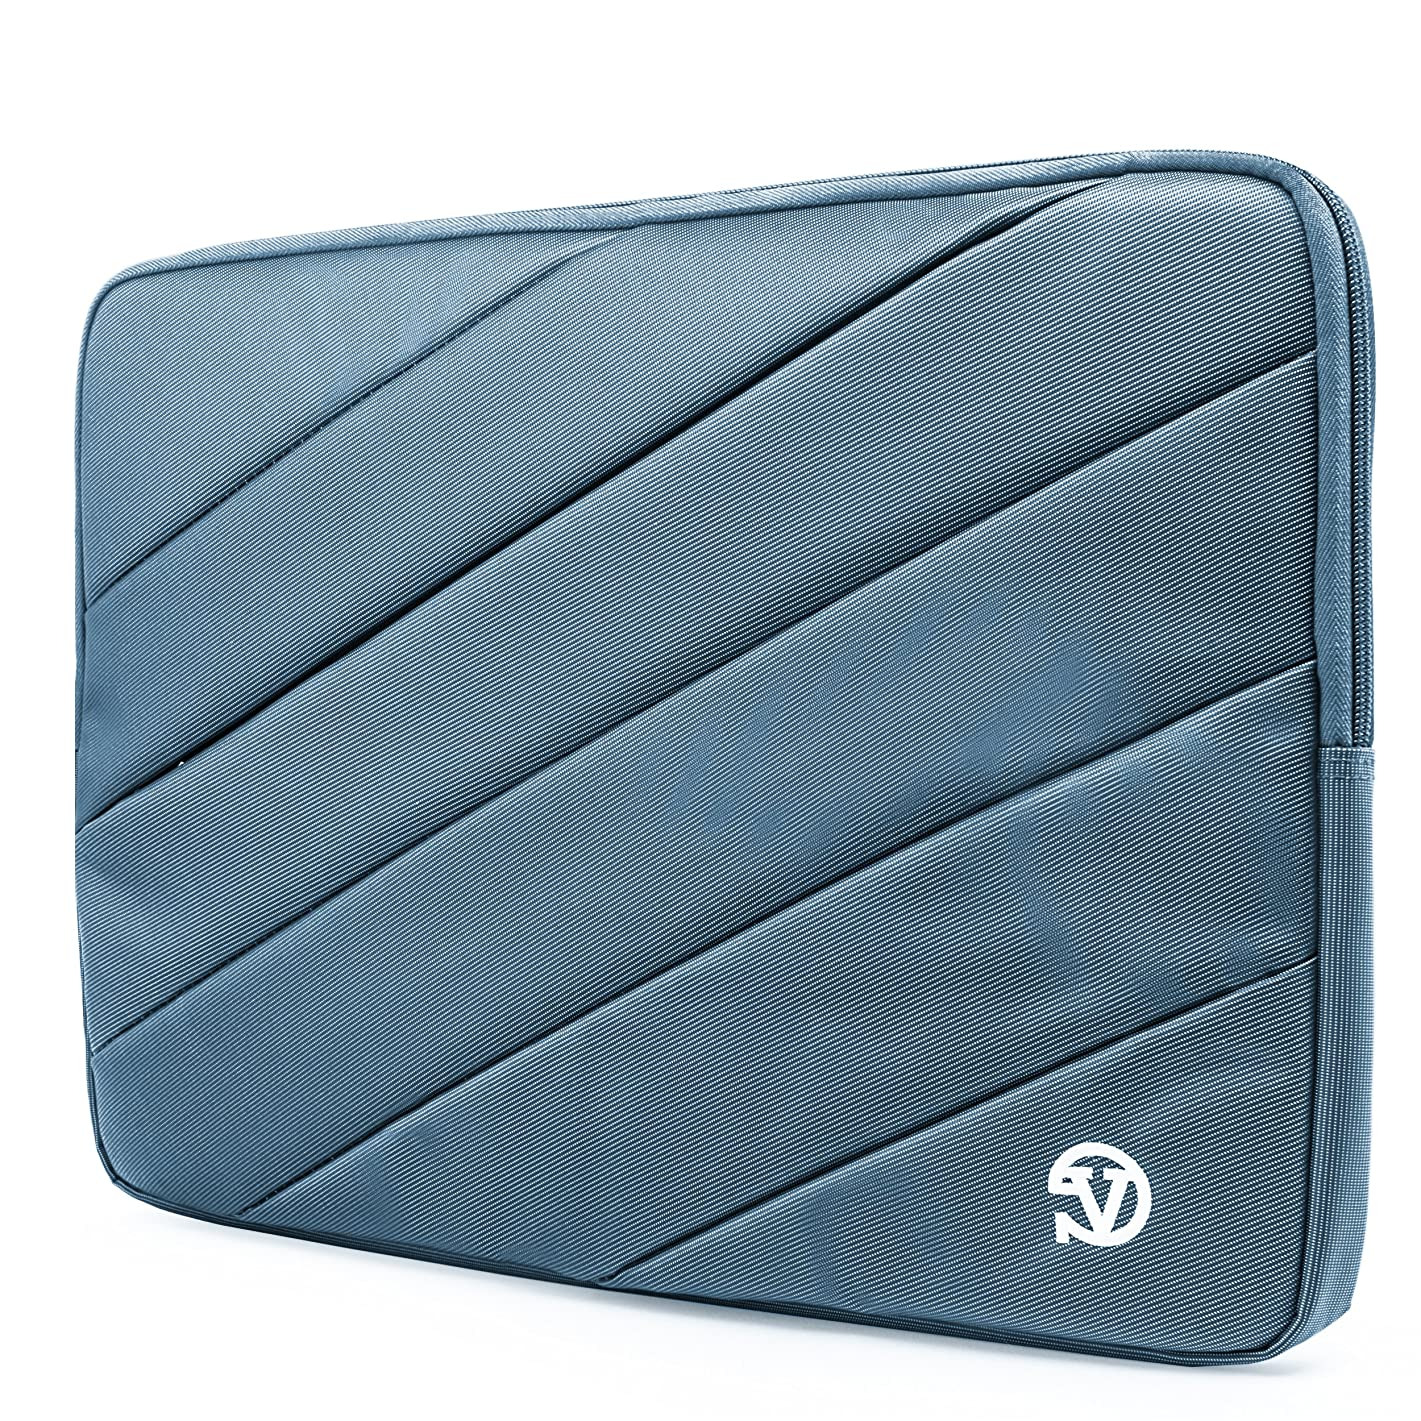 VanGoddy Sky Blue Shock Absorbing Sleeve Fit for AOC I1659FWUX, E1659FWUX, E1659FWU, I1601FWUX 16-inch Portable Monitor